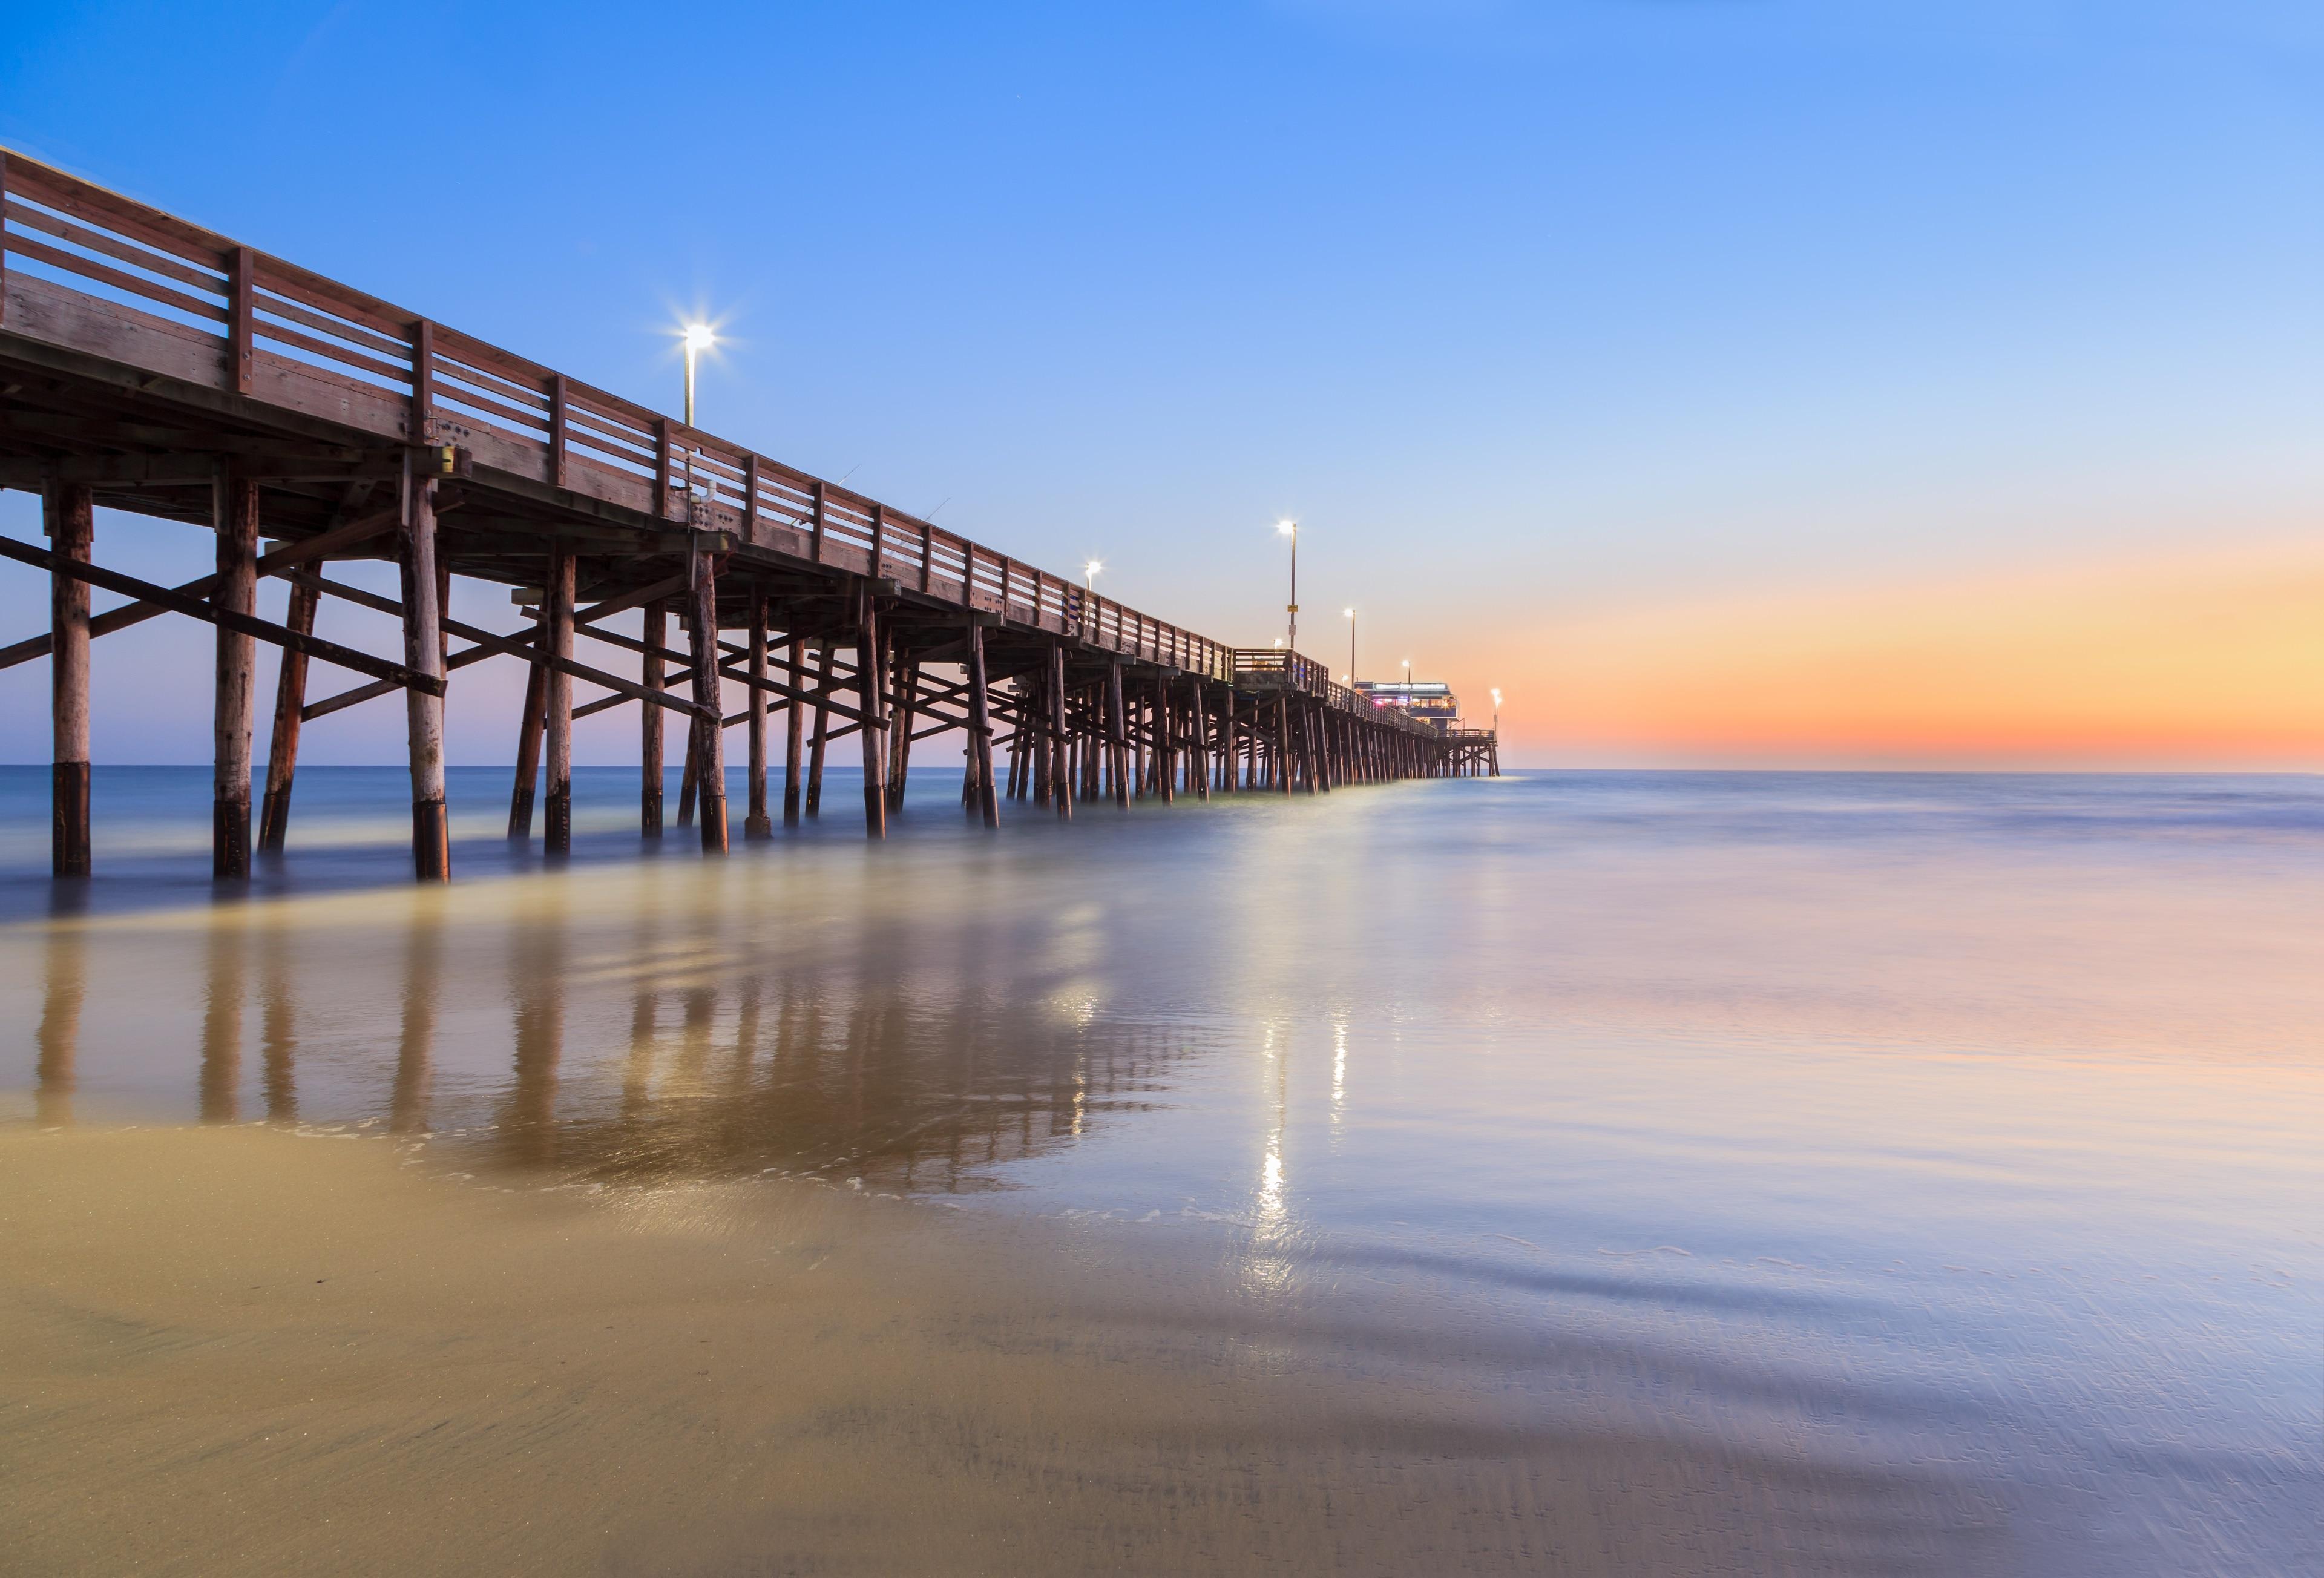 Newport Pier, Newport Beach, California, United States of America